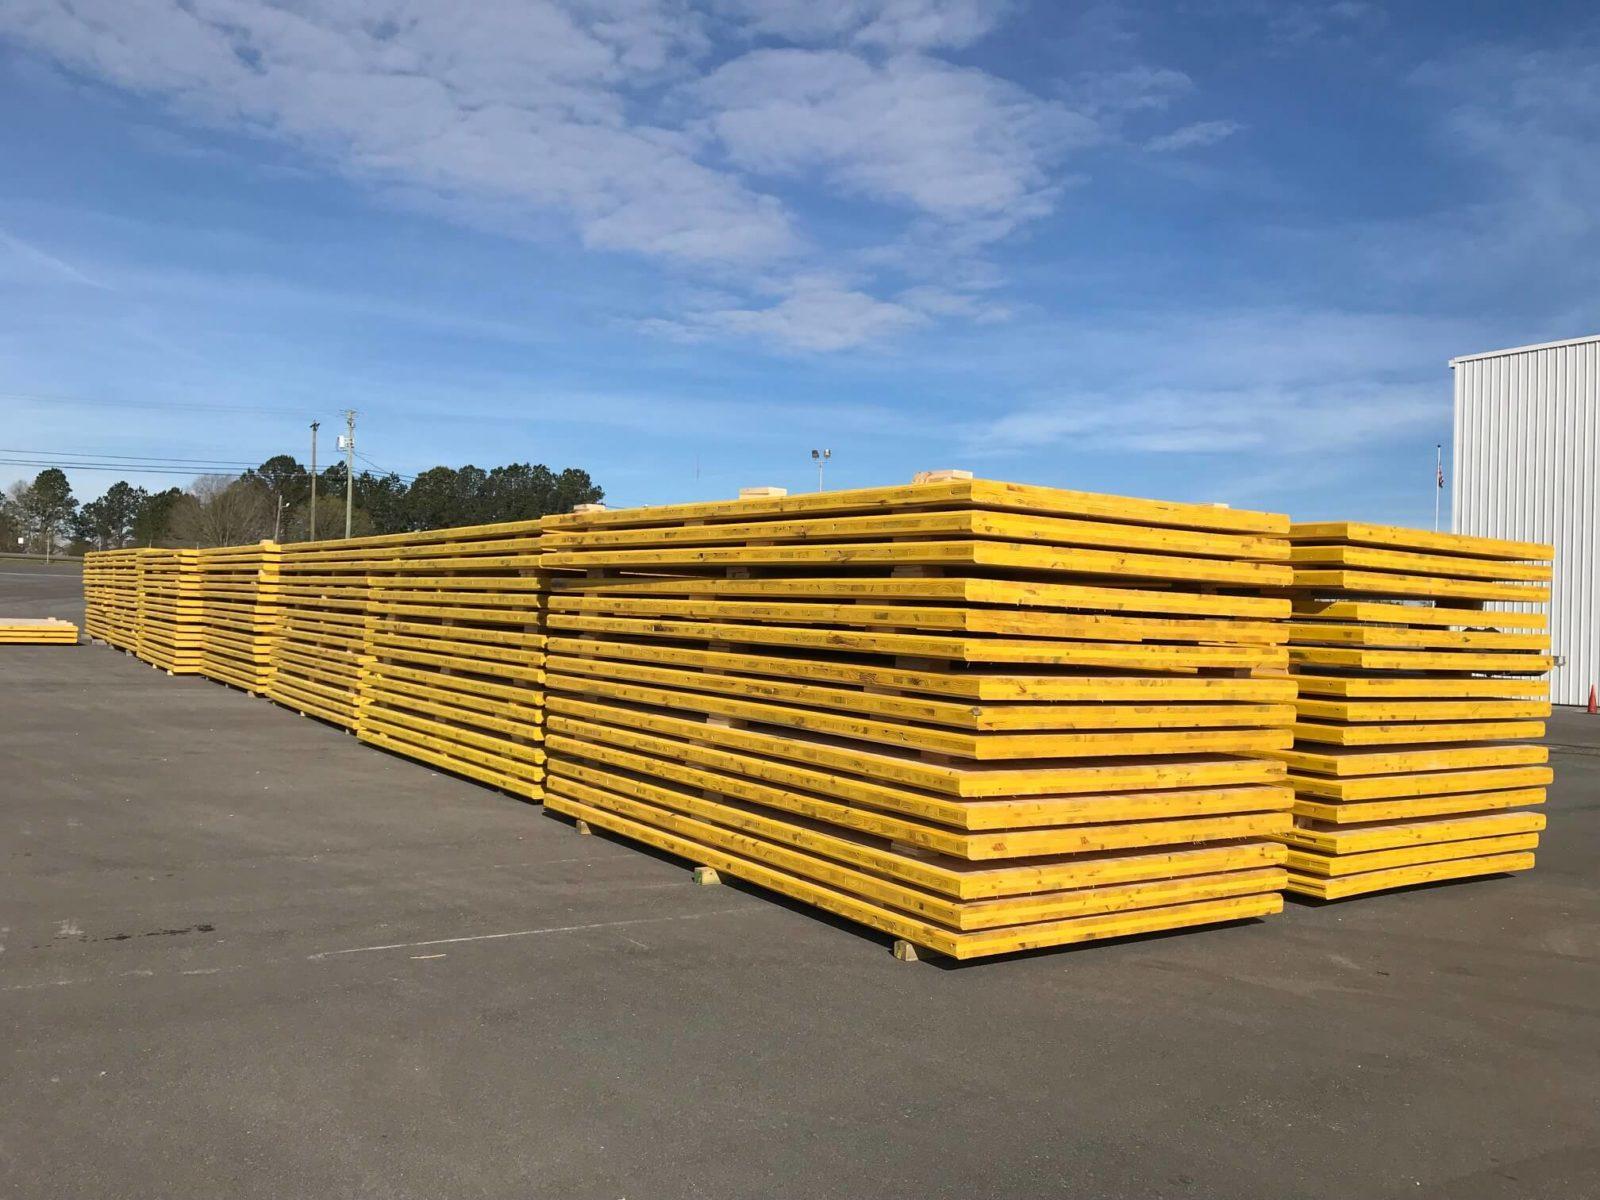 Timber Mats | Wooden Construction, Logging, & Excavator Mats